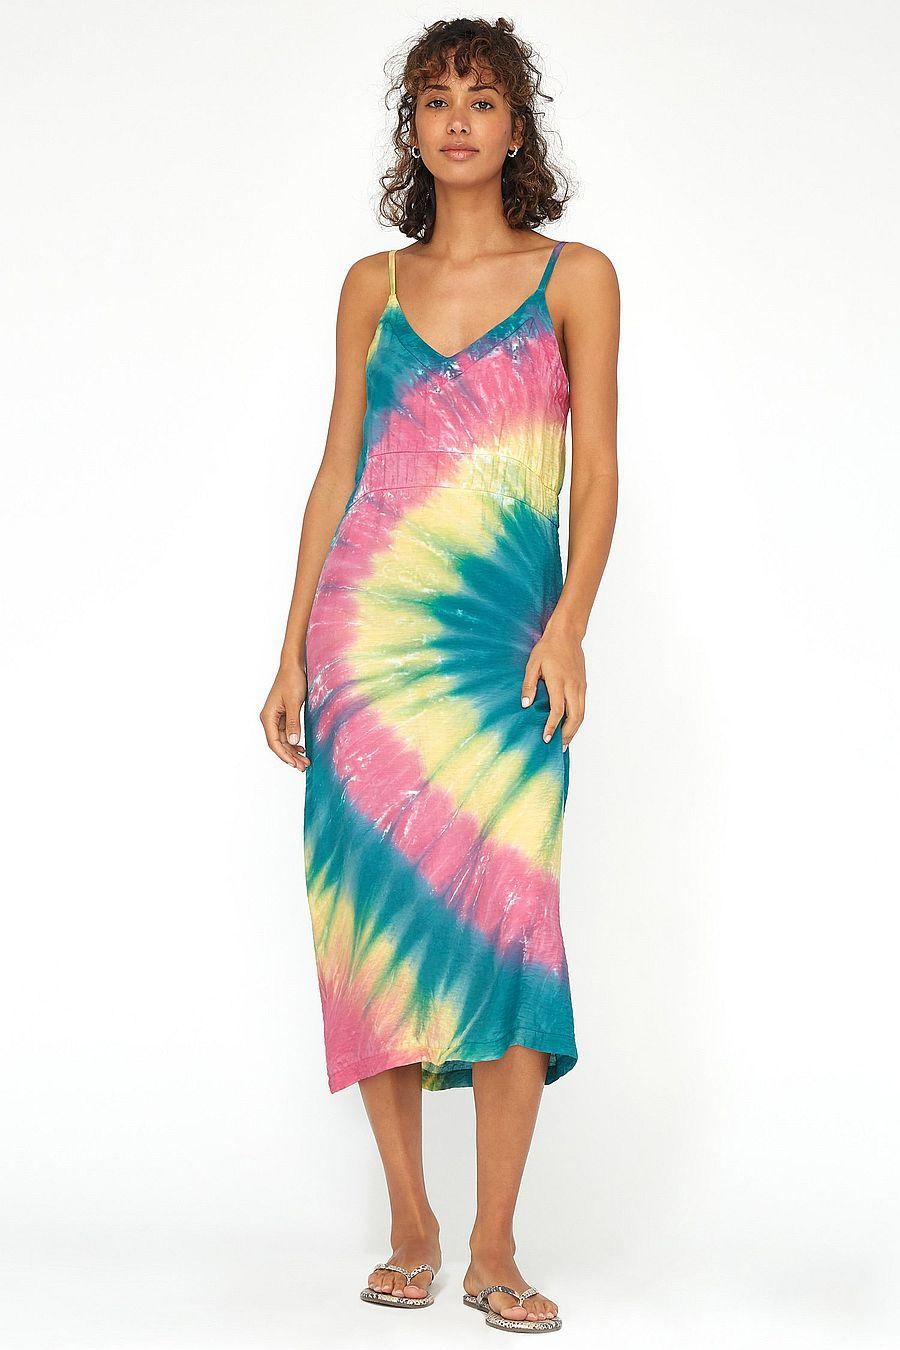 LACAUSA Clothing Alma Slip Dress - Cosmic Swirl